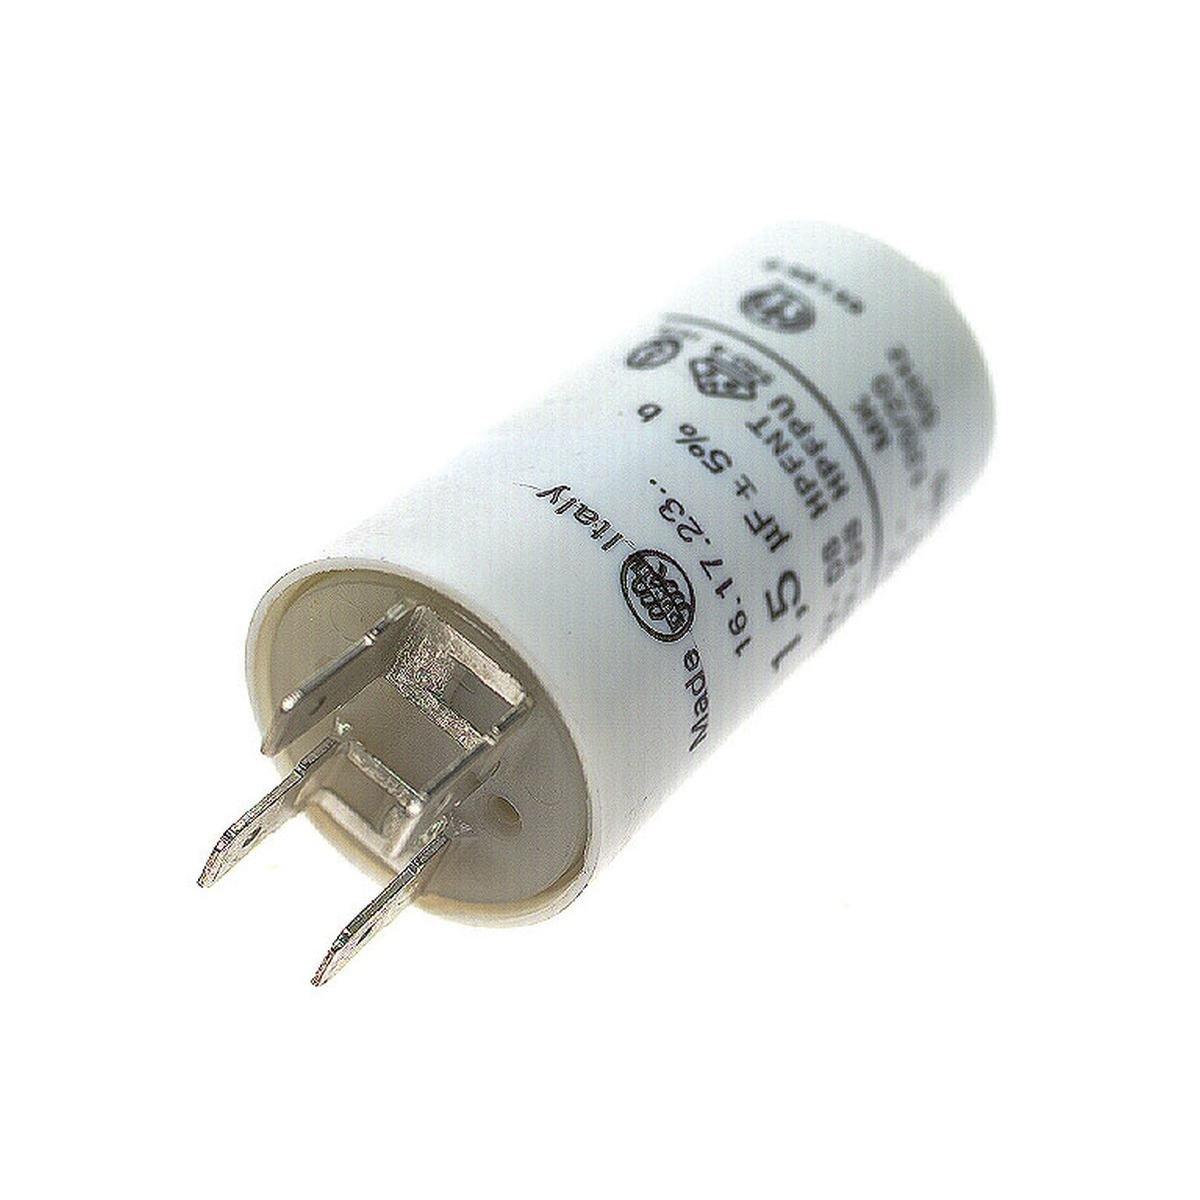 Kondensator 50,0 µF 450V